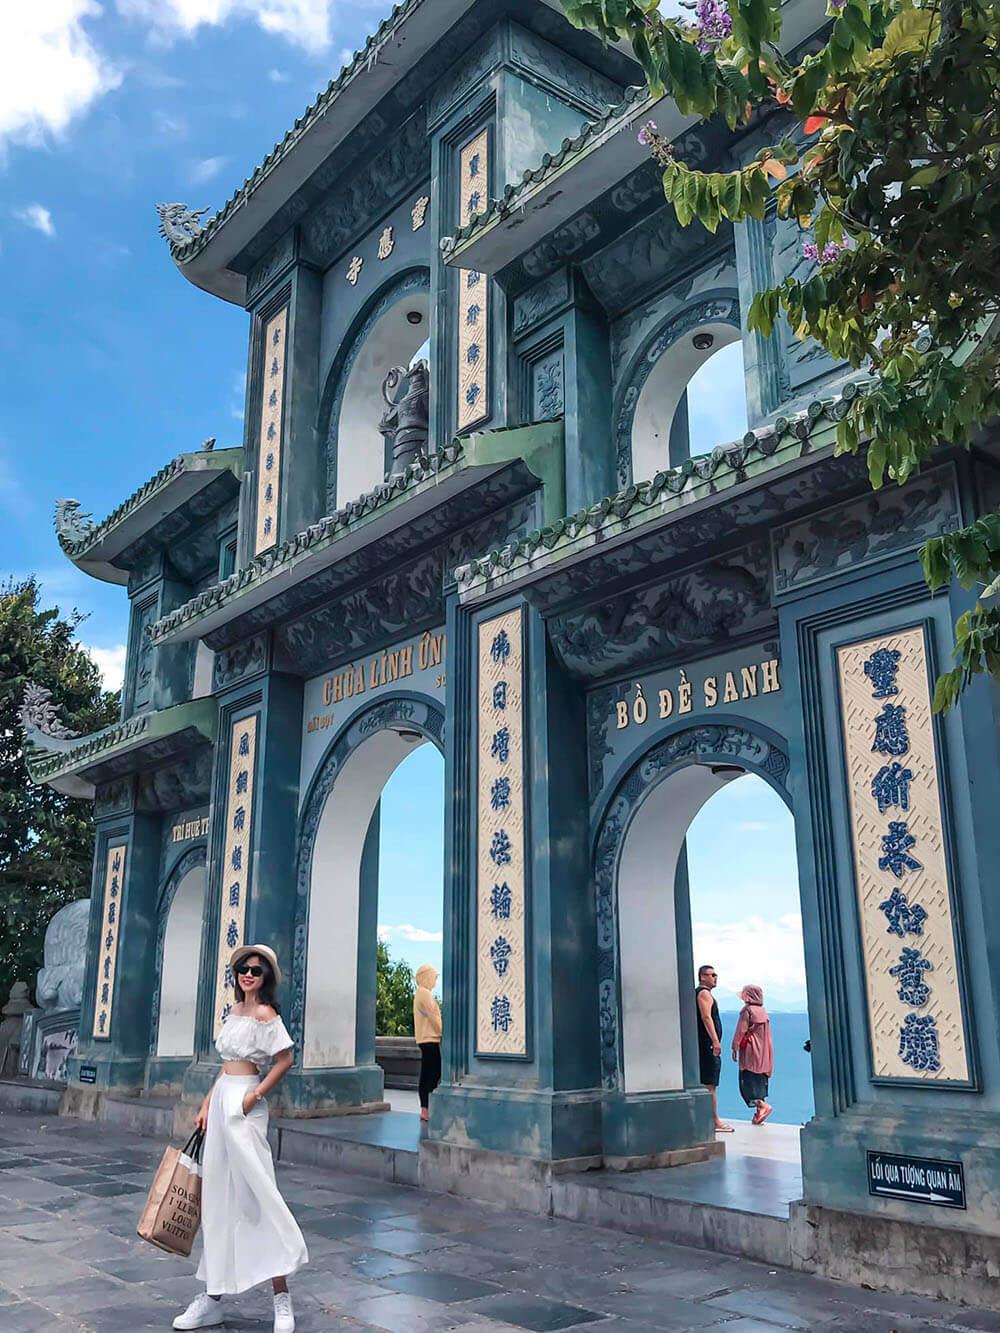 Chua Linh Ung Son Tra Danang Review Chuyen Du Lich Hoi An Da Nang Chanh Sa 3n2d 01